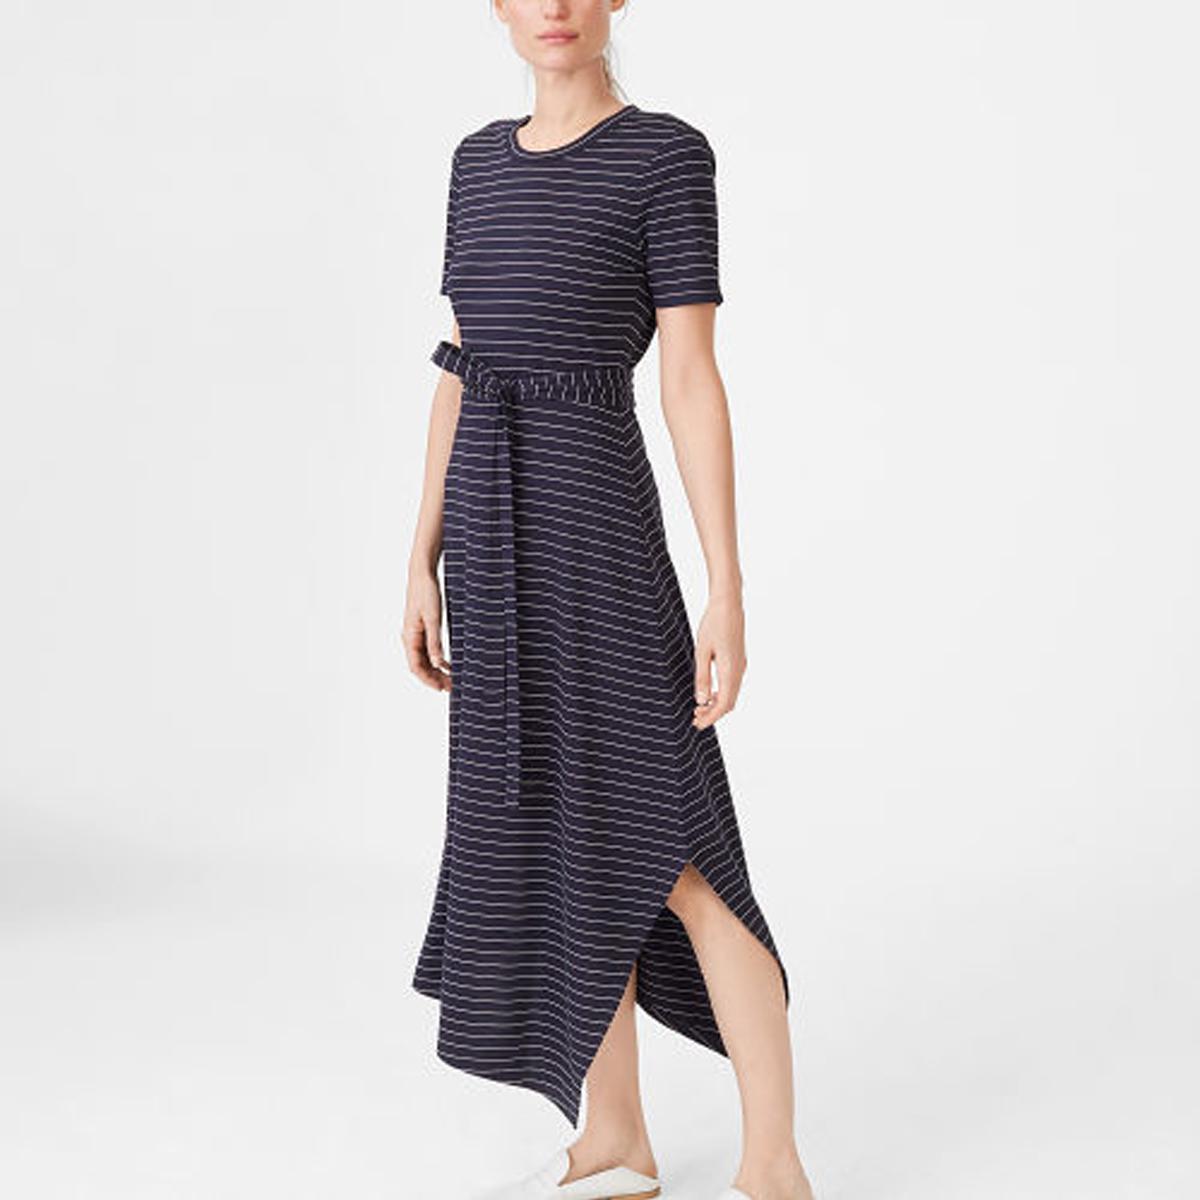 Elianna Dress   HK$1,790